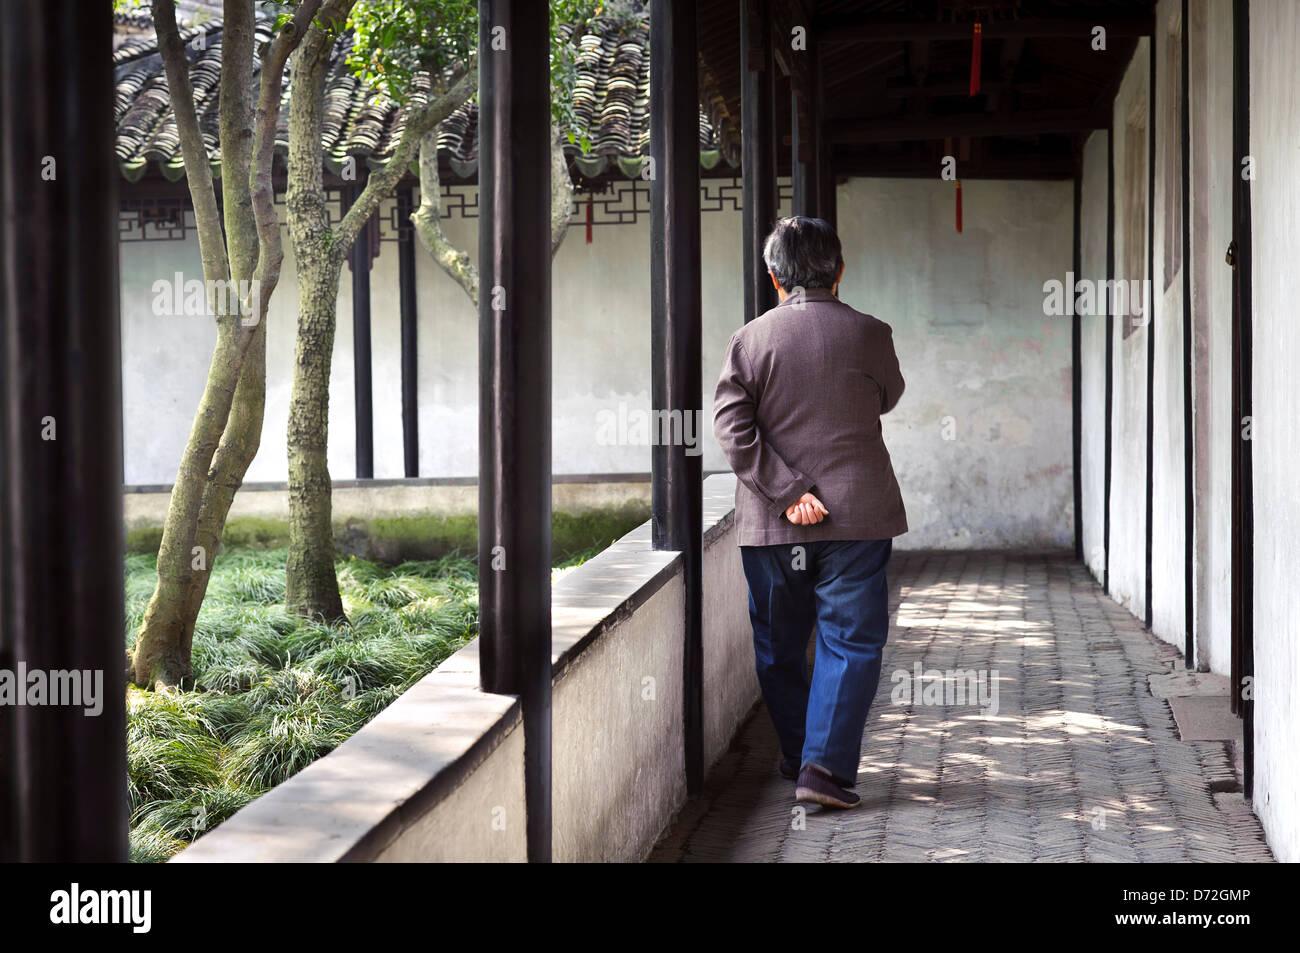 Vieille femme se promenant dans l'Humble Administrator's Garden, Suzhou Photo Stock